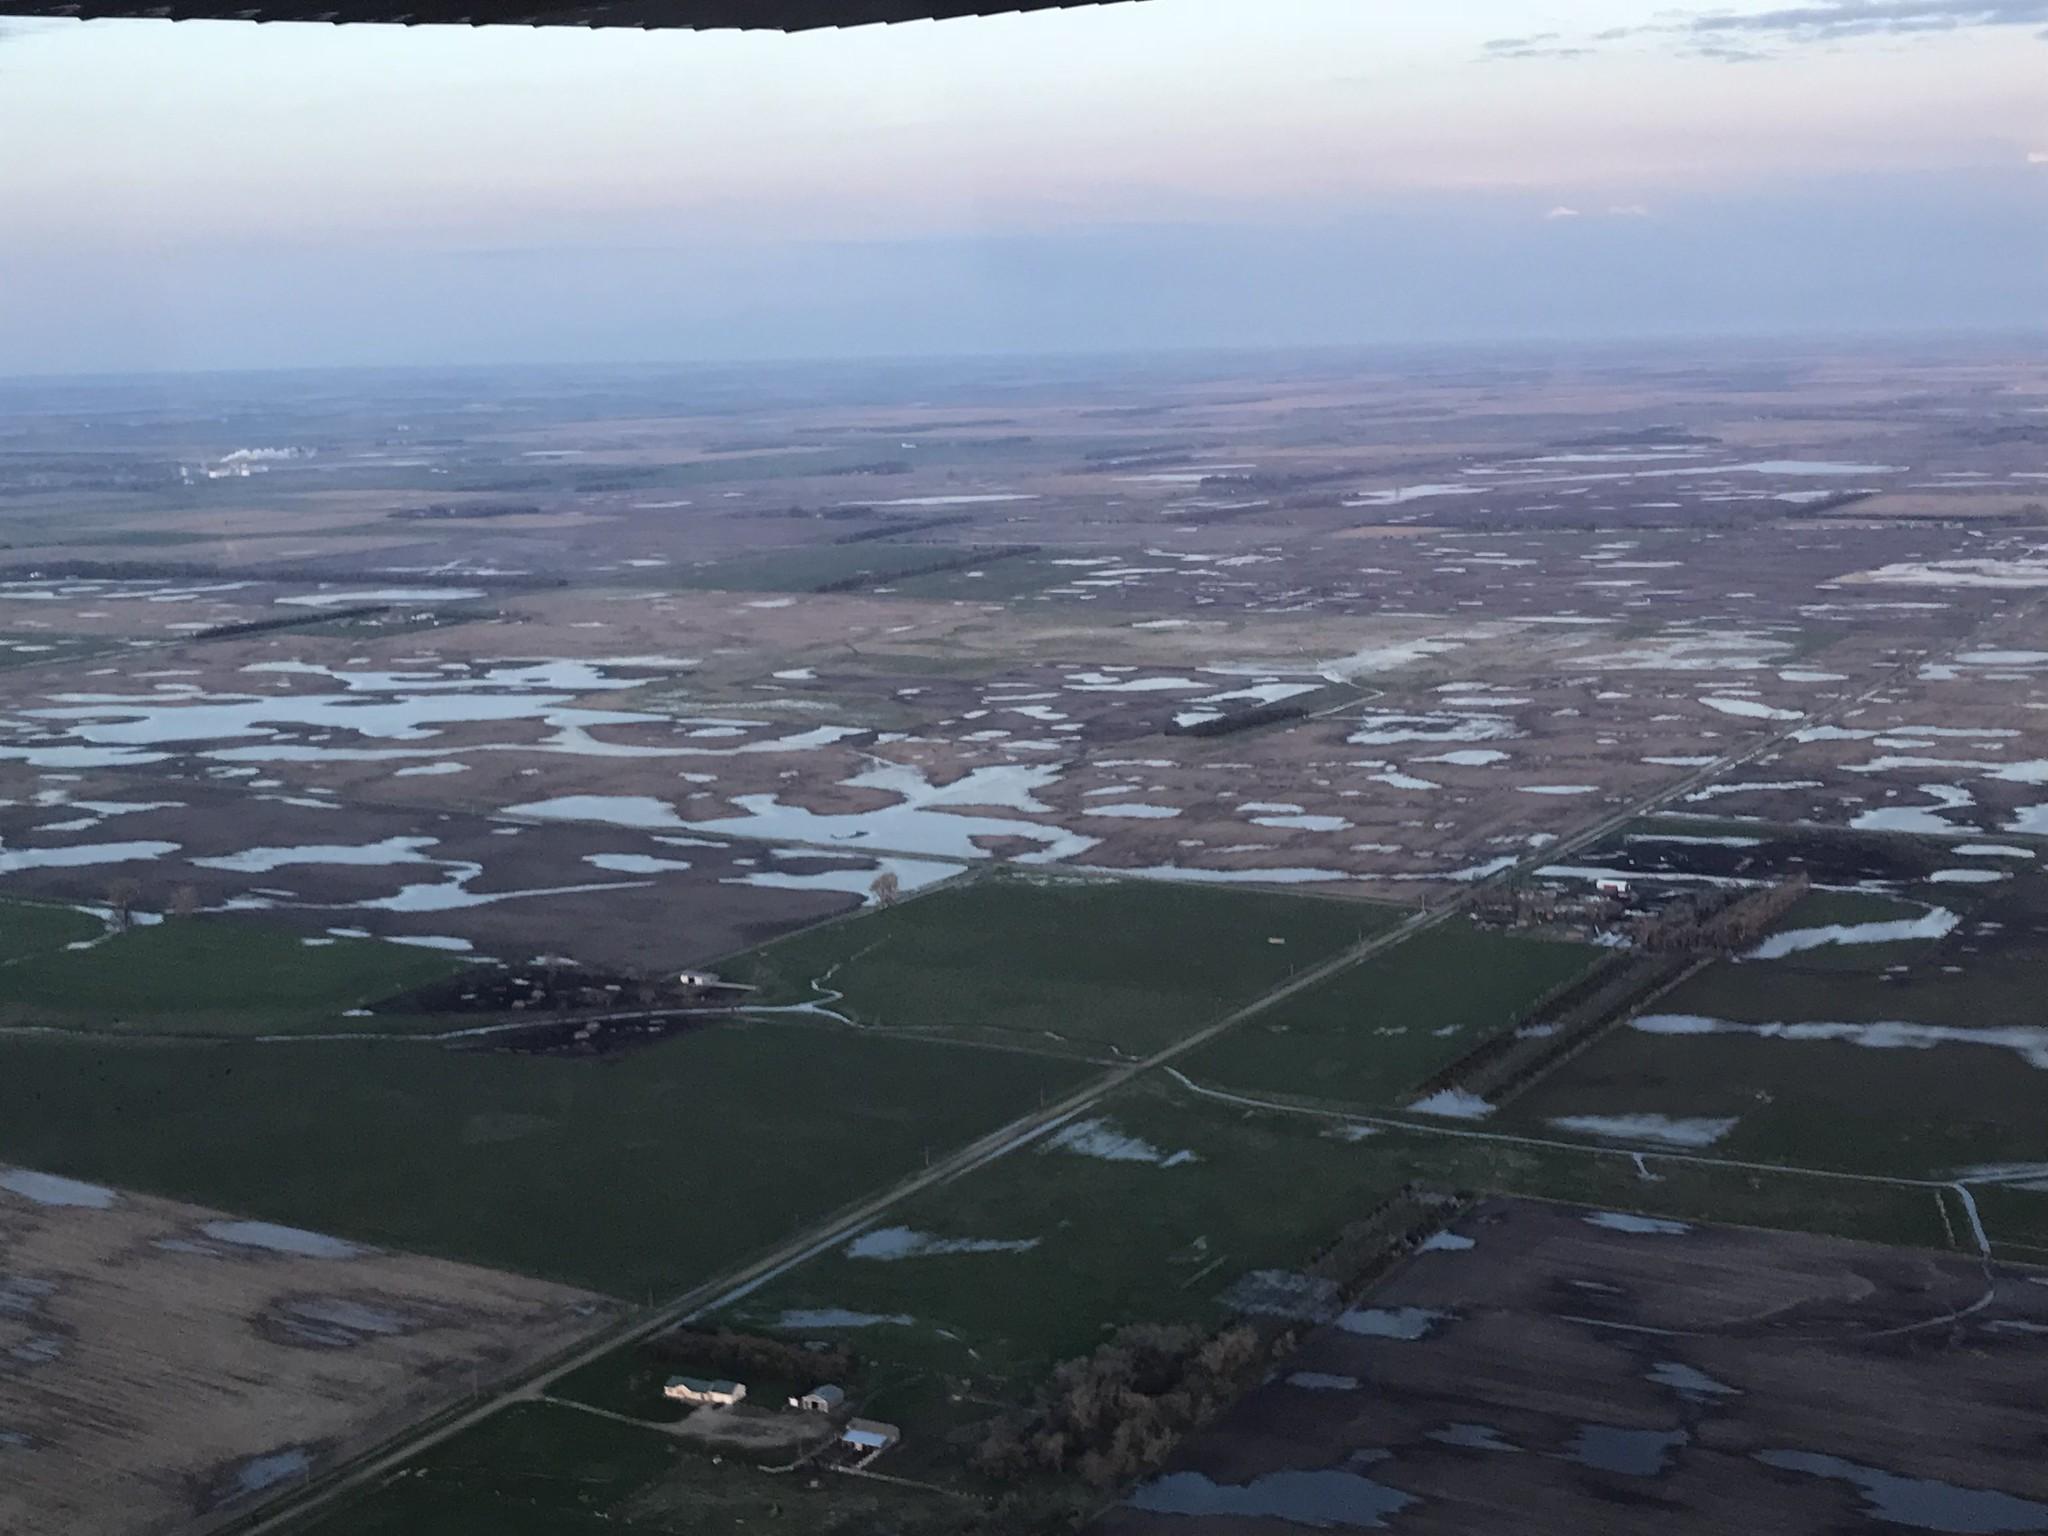 North of Mitchell, SD. USFWS